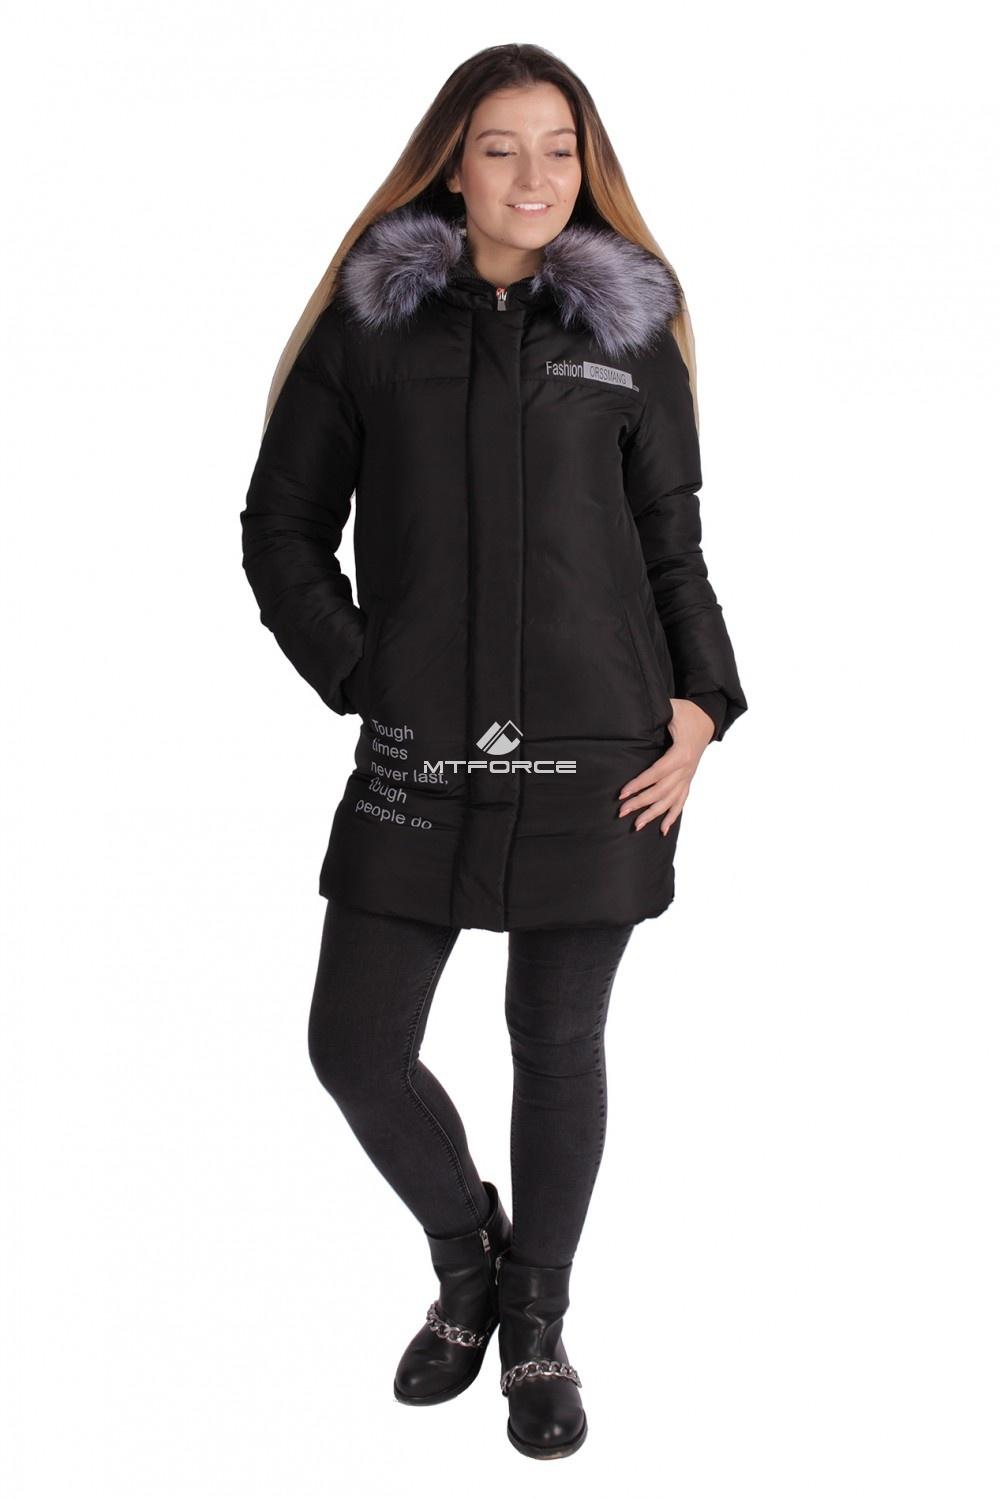 Купить                                  оптом Пуховик ТРЕНД женский зимний черного цвета 16031Ch